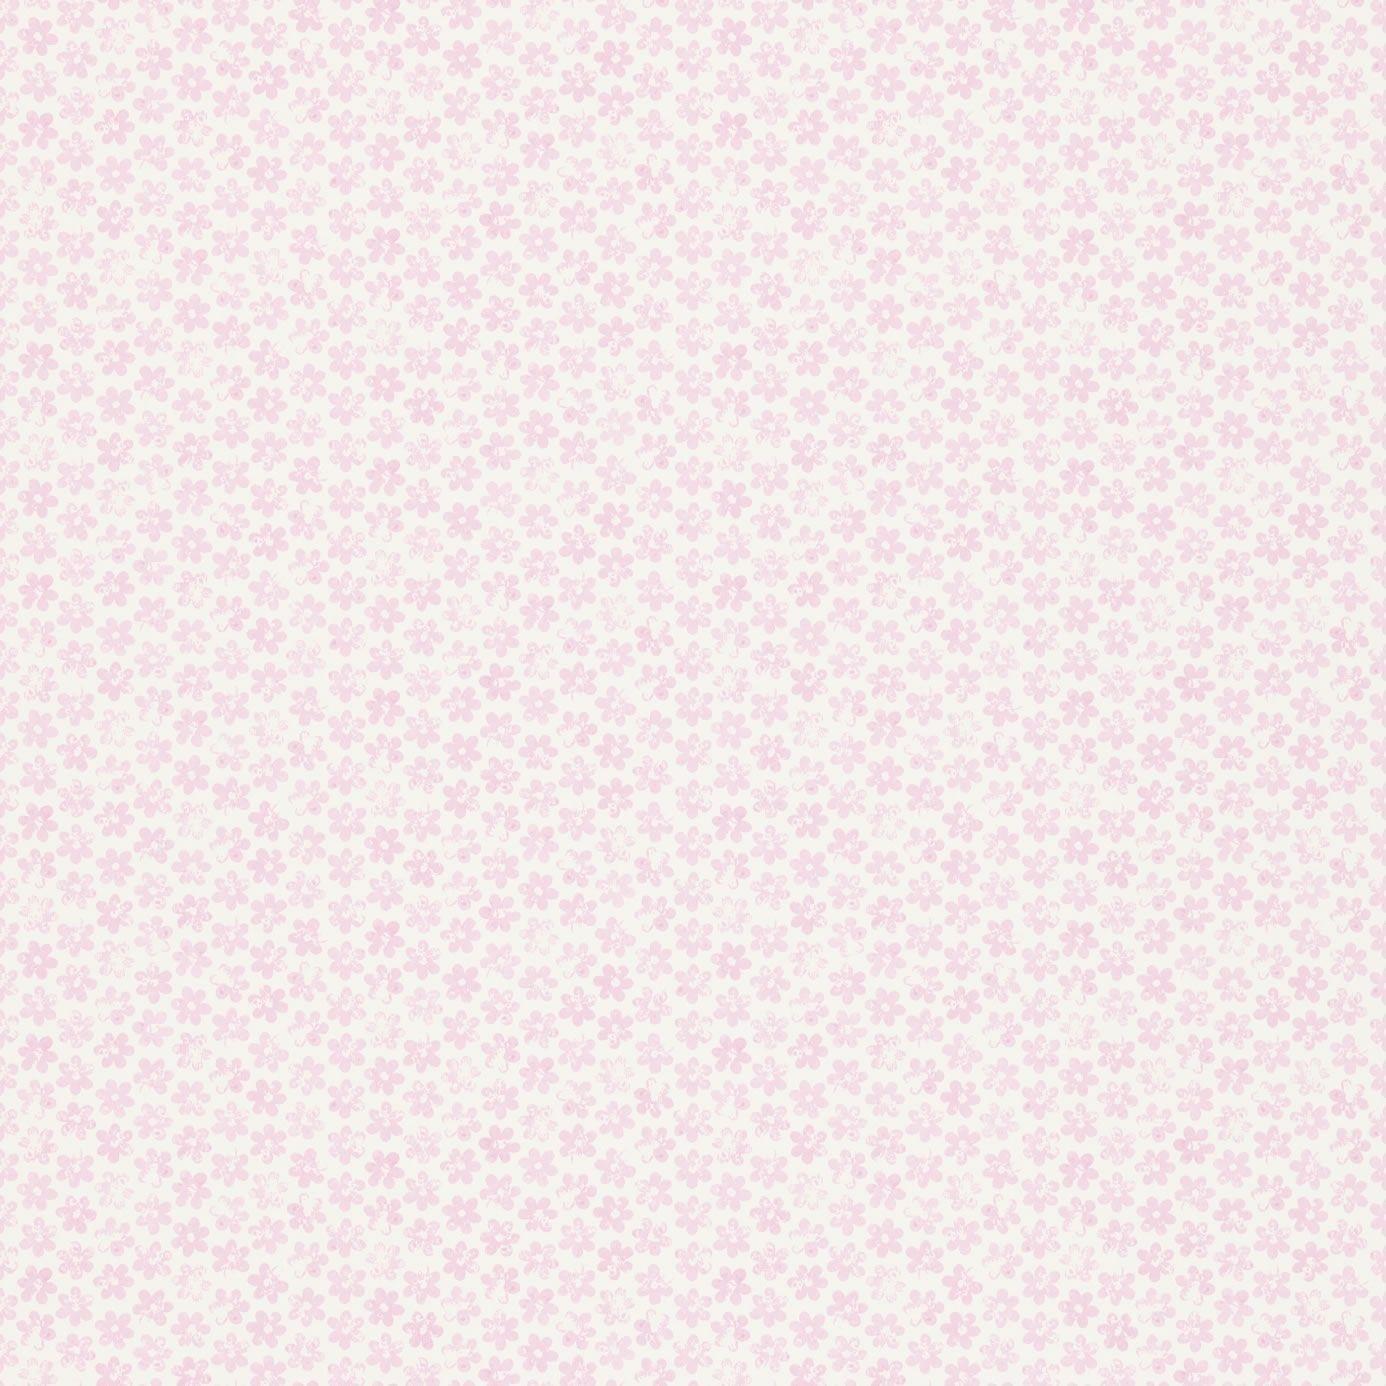 soft pink backgrounds wallpapersafari